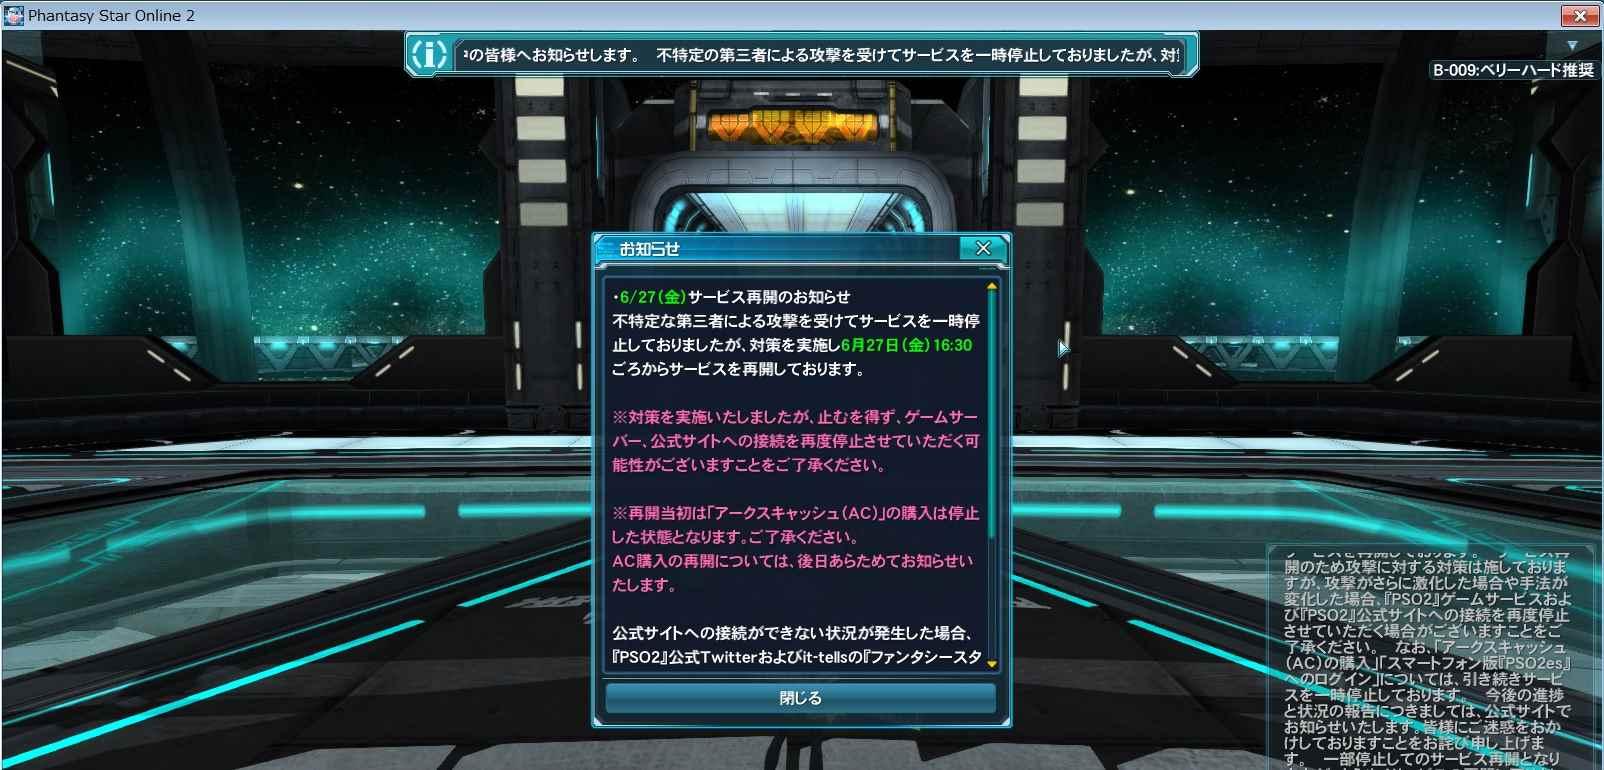 PSO2-0627-01.jpg